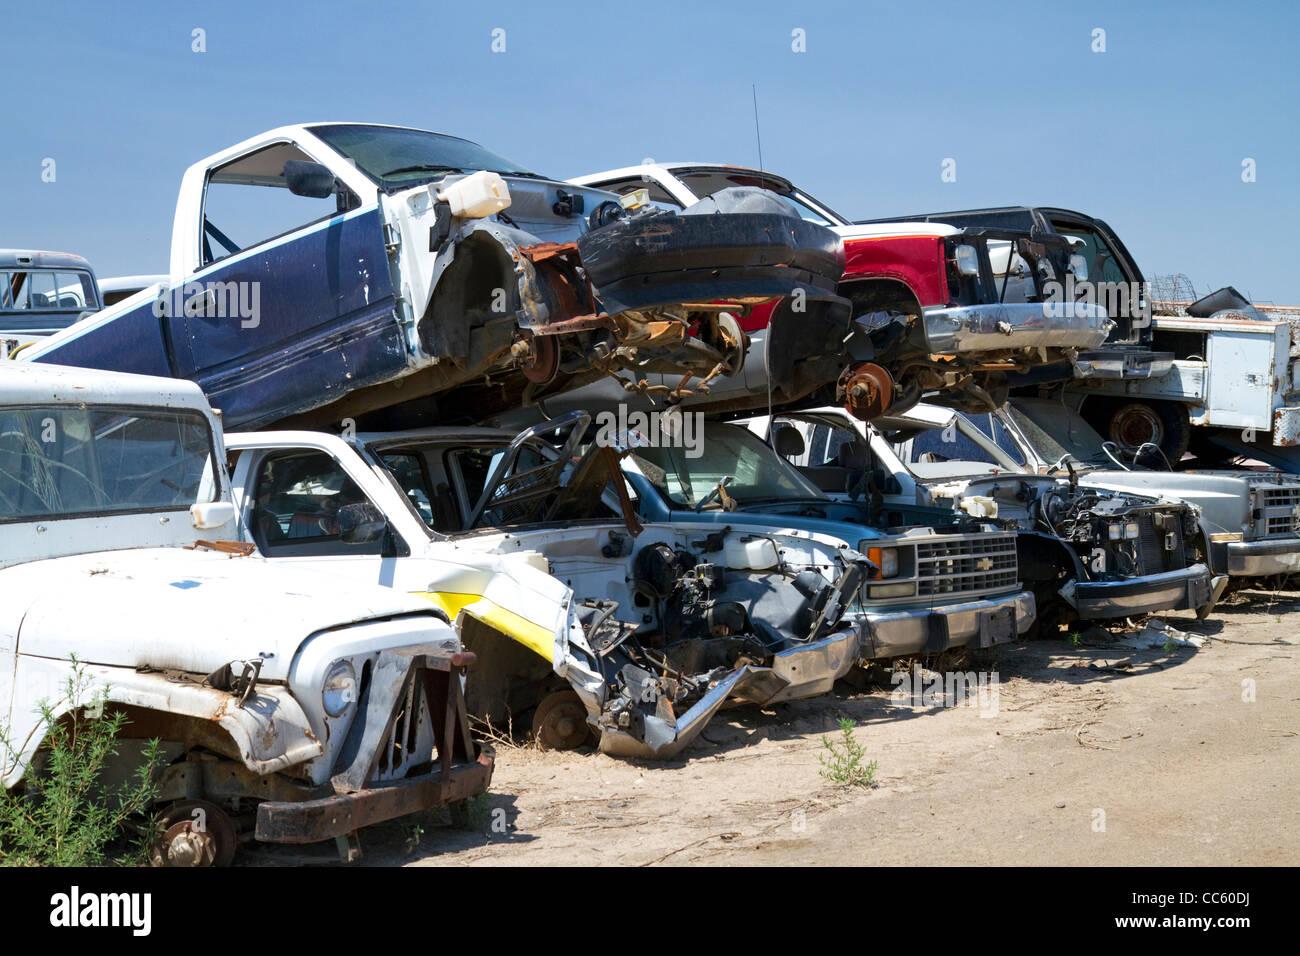 Demolición de automóviles patio cerca de Caldwell, Idaho, USA. Imagen De Stock